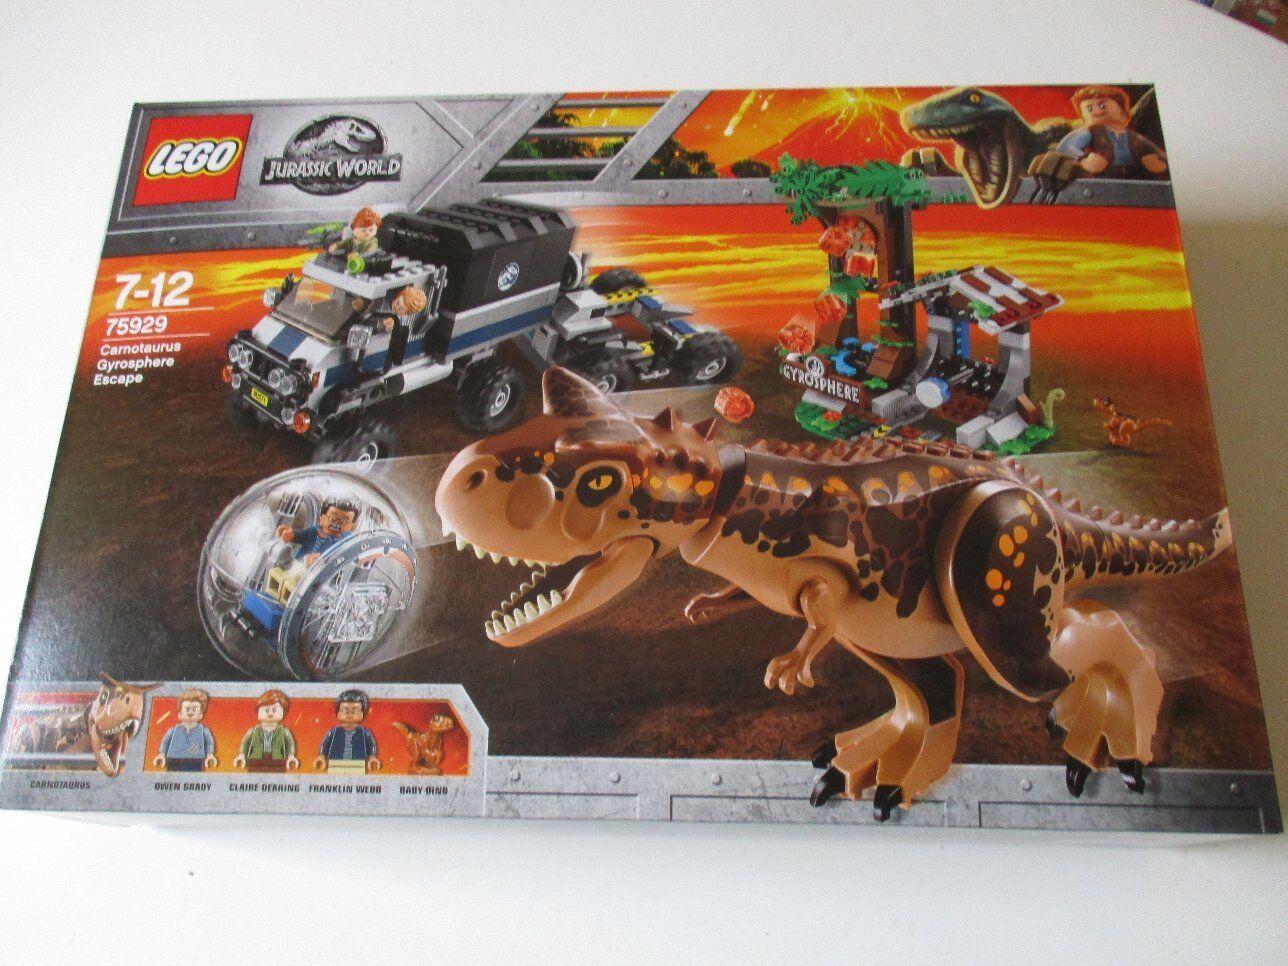 LEGO 75929 Jurassic World Carnotaurus Gyrosphere Escape NEU OVP ungeöffnet